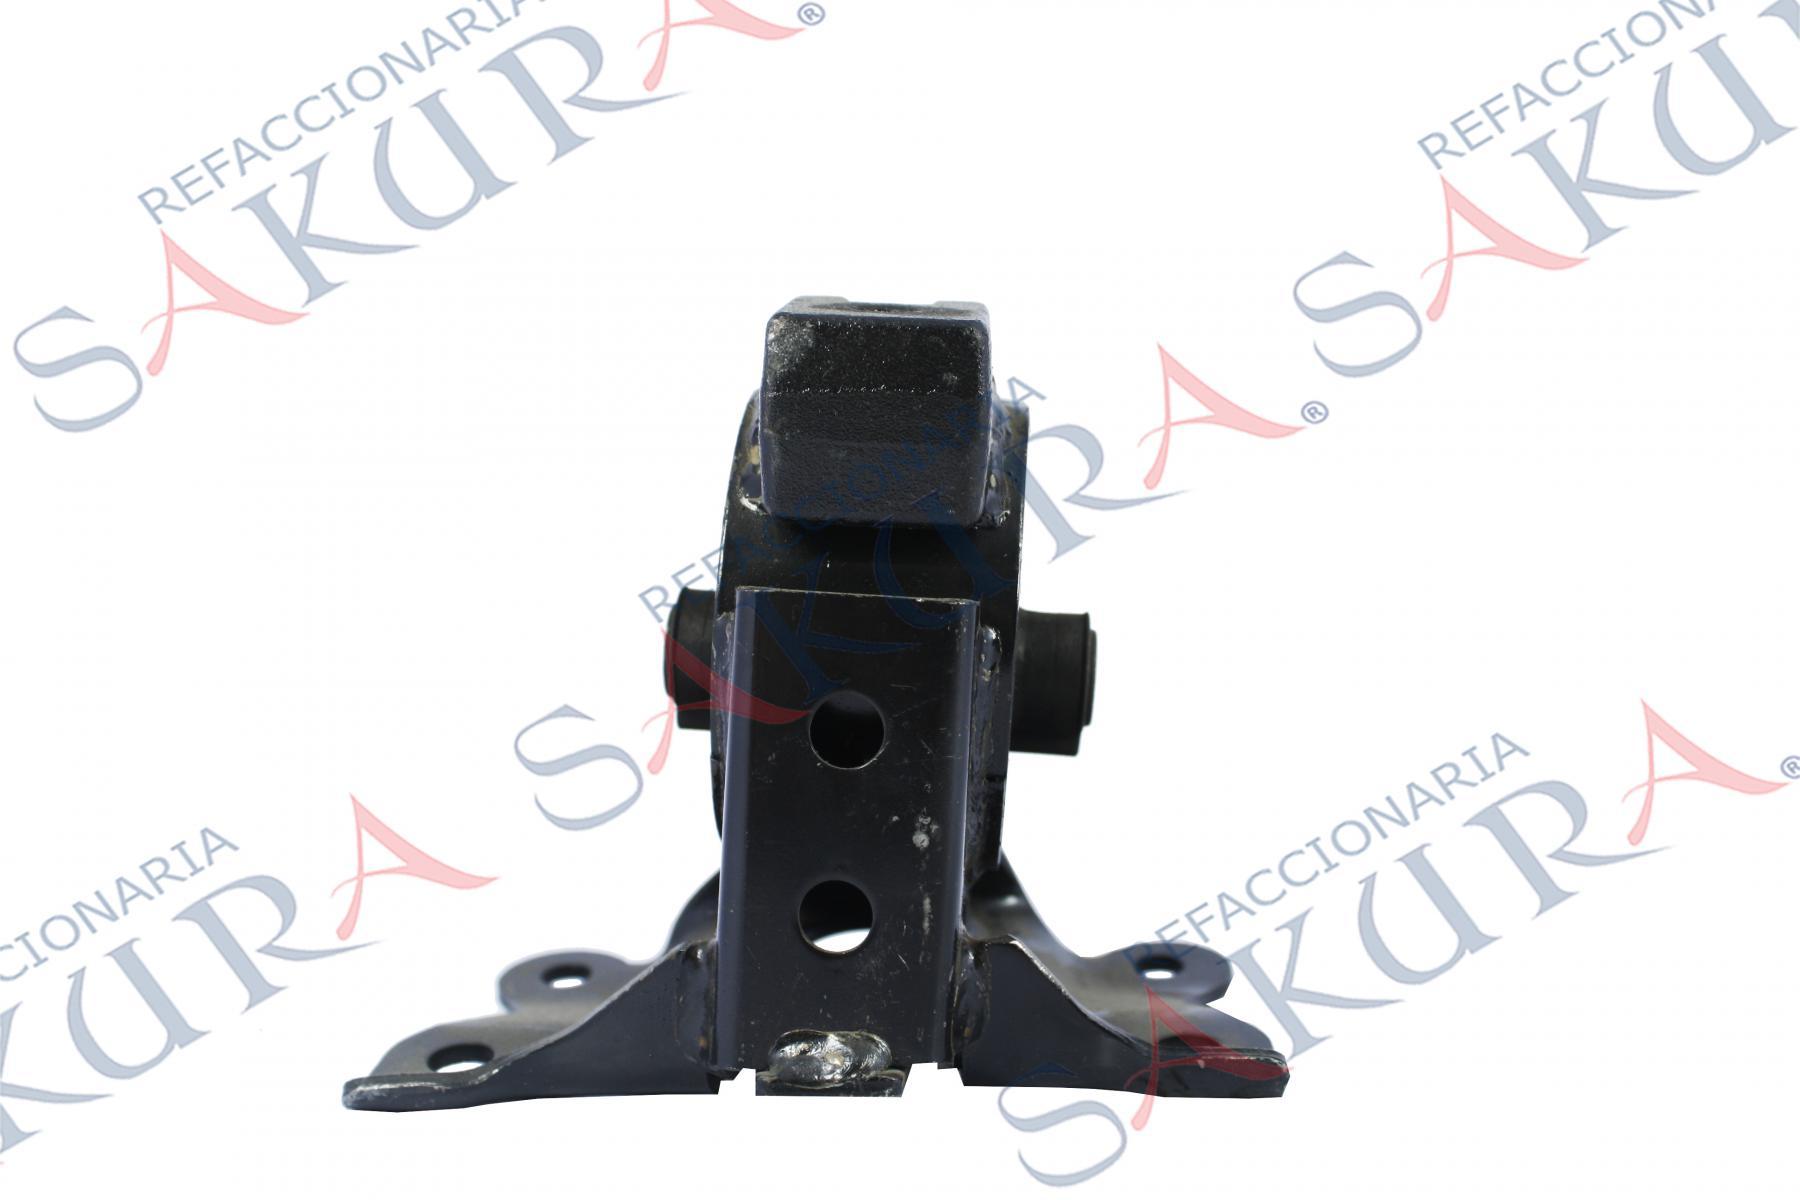 112208H310, Soporte Caja Velocidades  (Nissan)